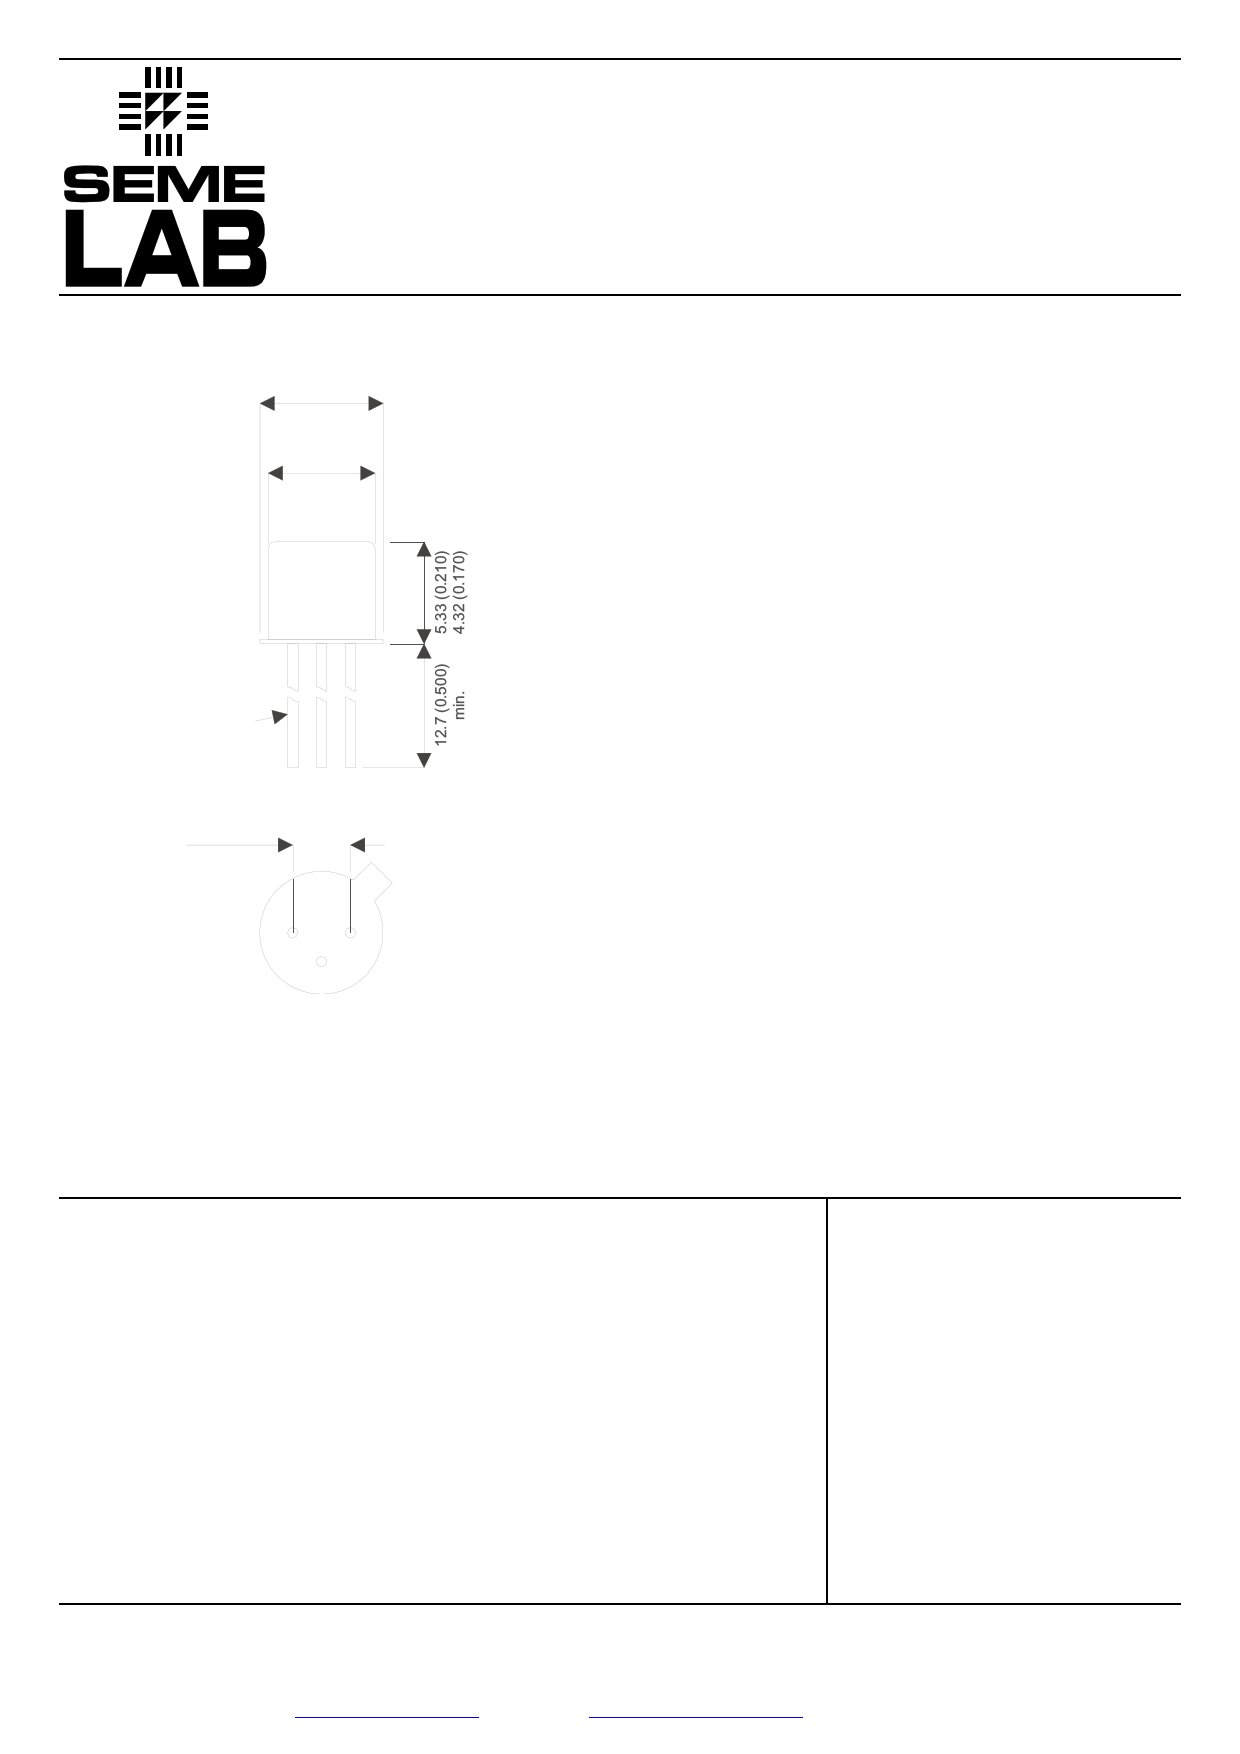 2N2369A1 데이터시트 및 2N2369A1 PDF